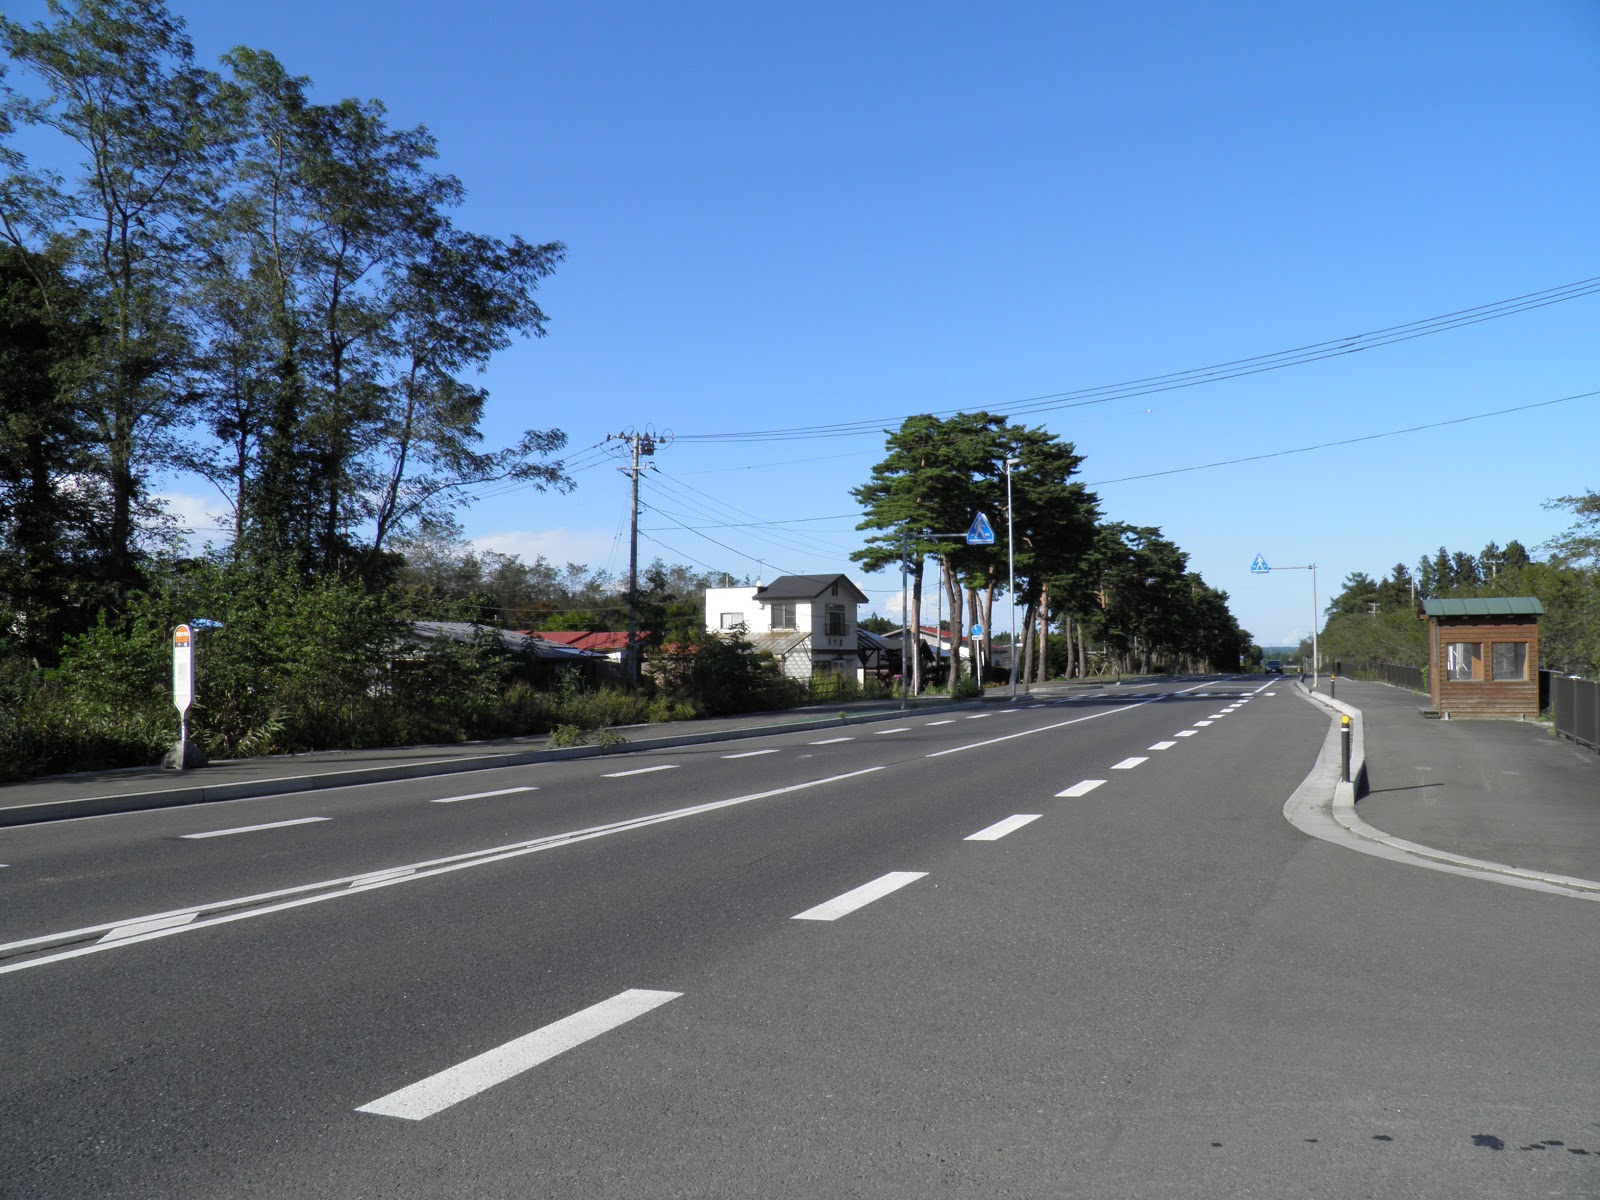 七戸町 - Shichinohe, Aomori - JapaneseClass.jp